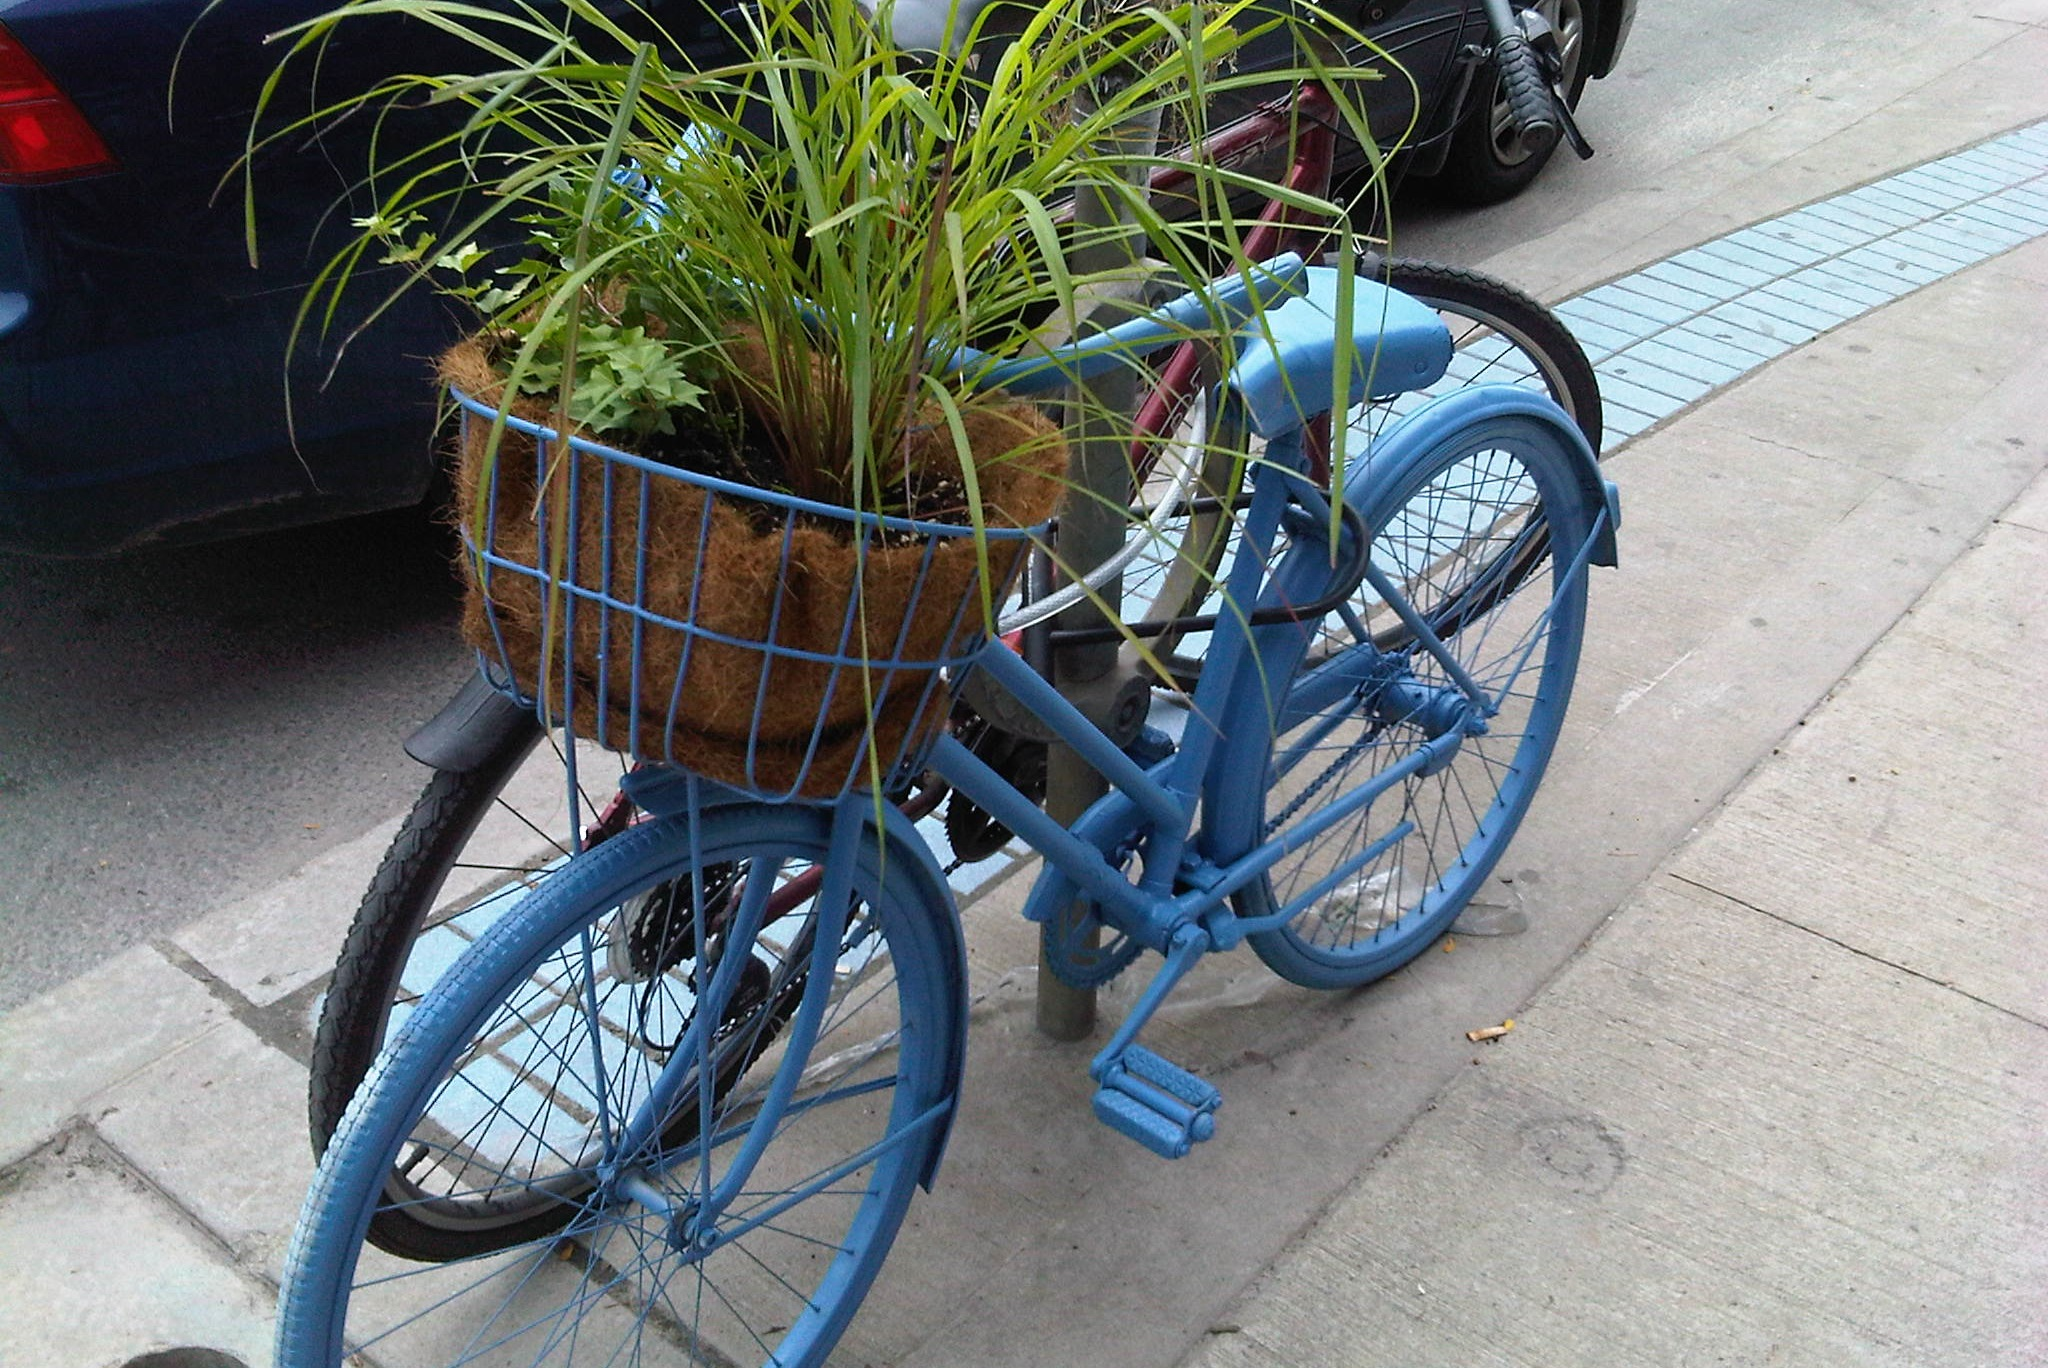 Bikes and plants